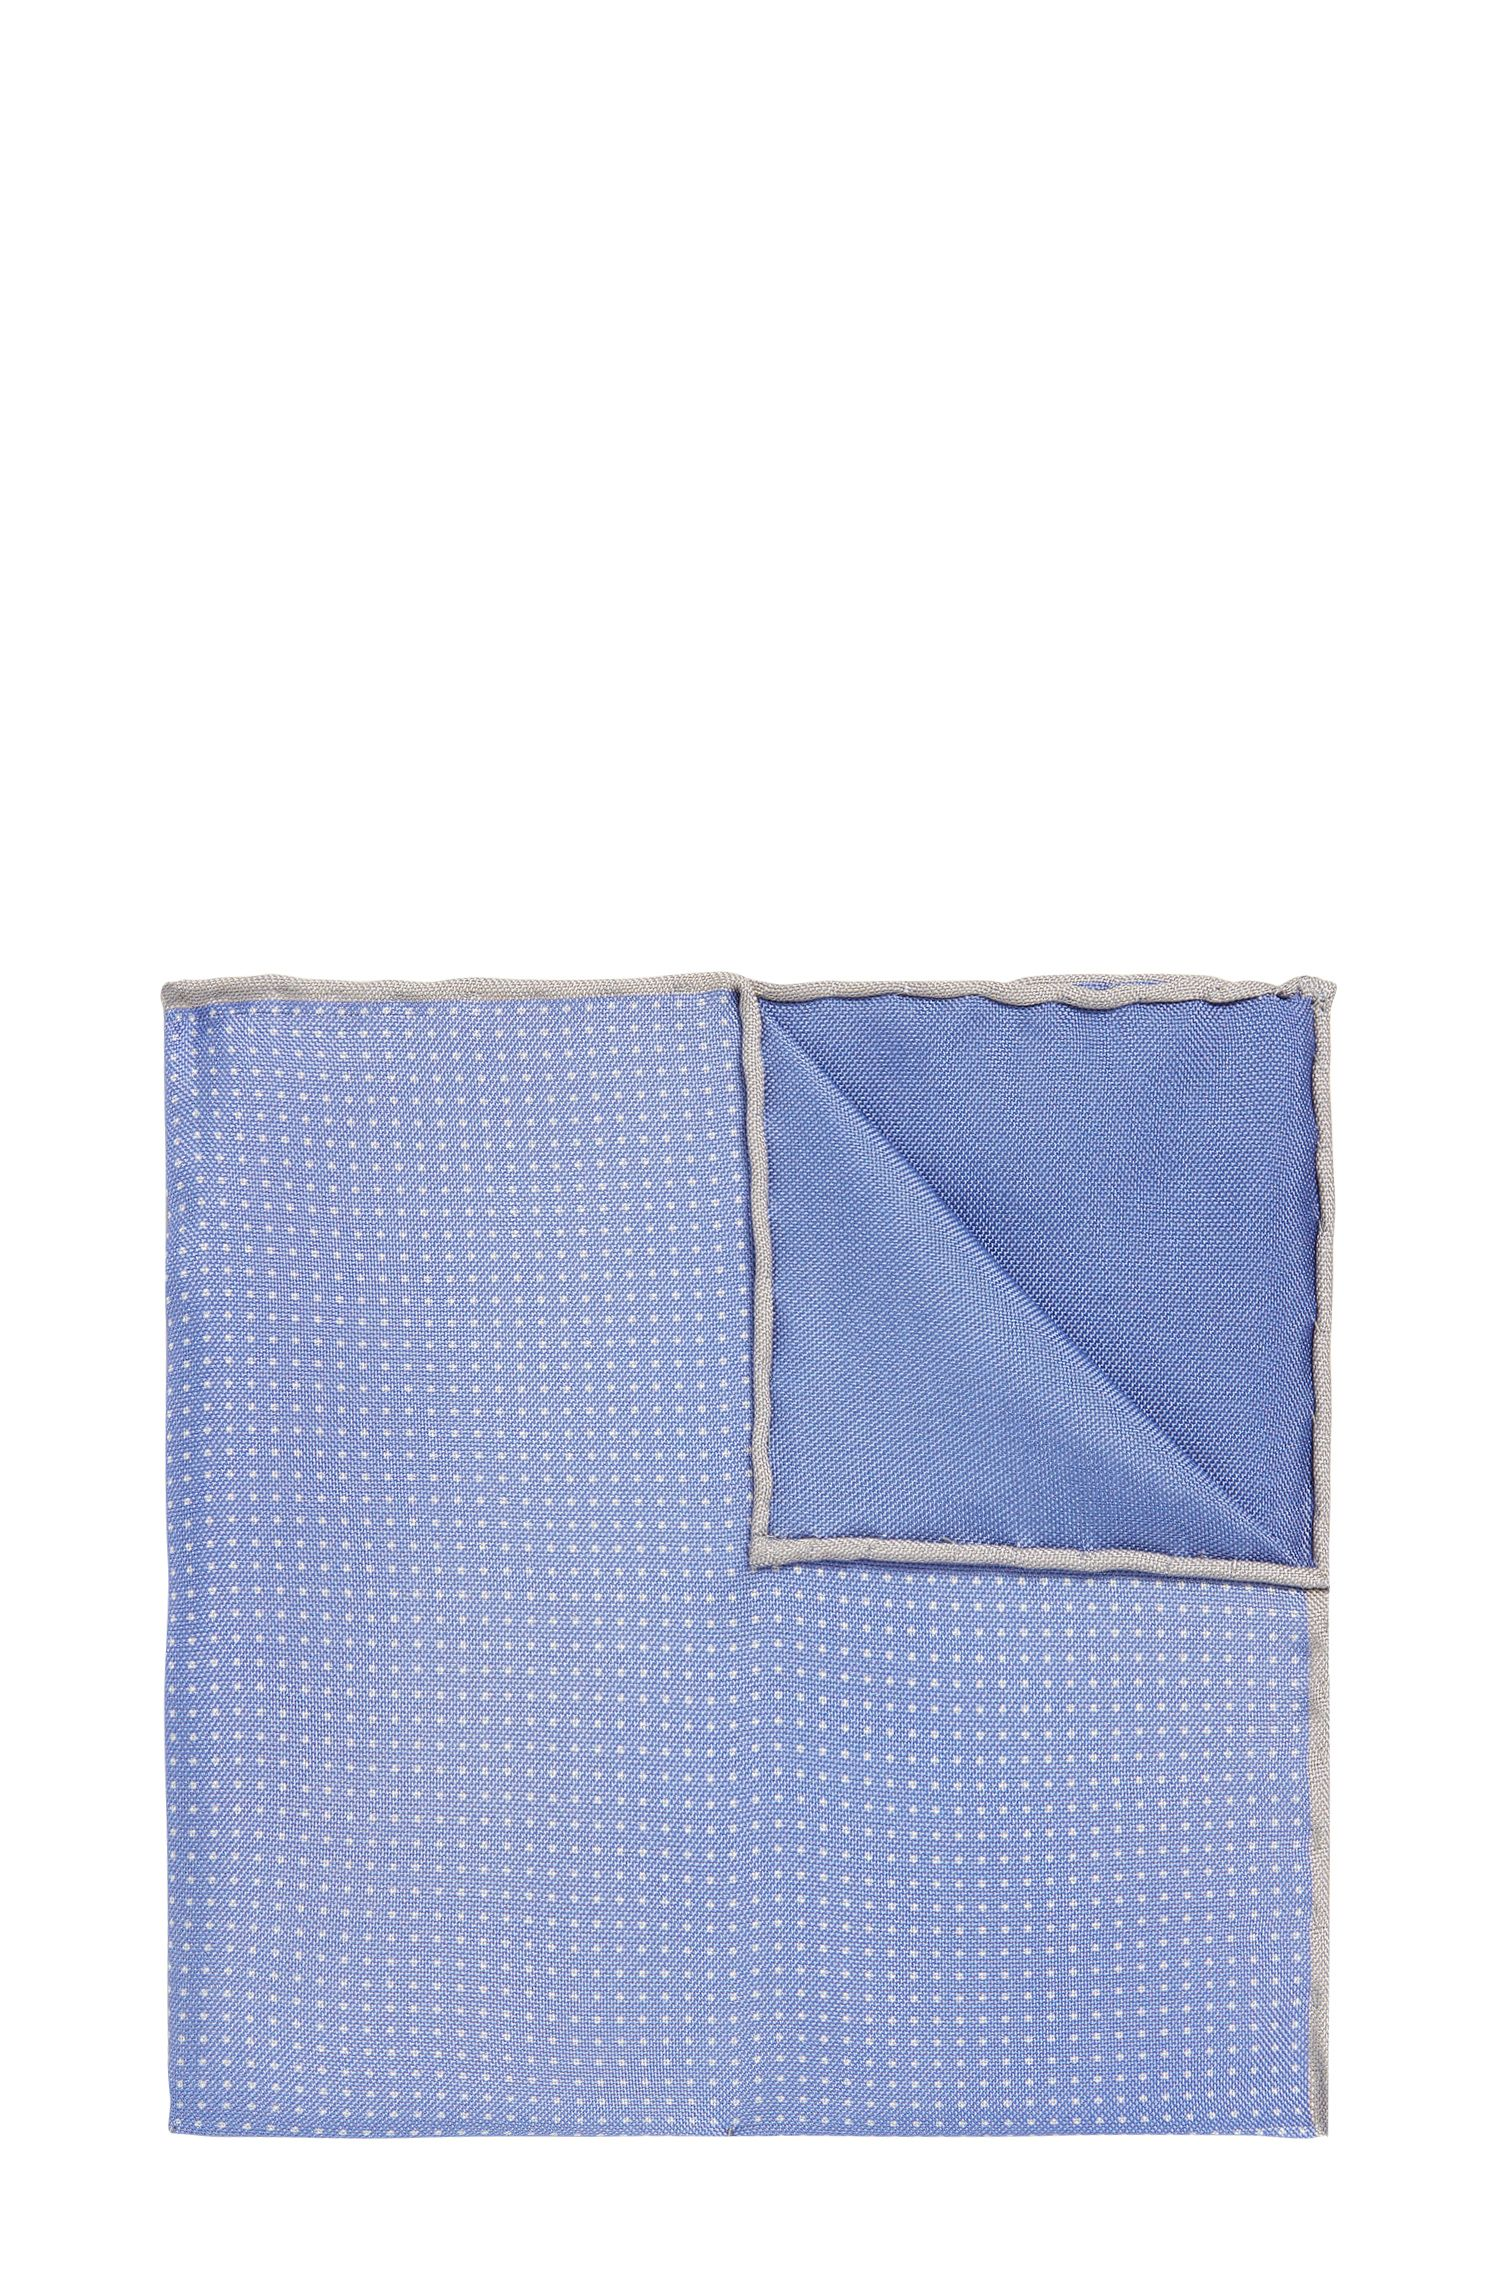 BOSS Tailored Pindot Italian Silk Pocket Square, Blue